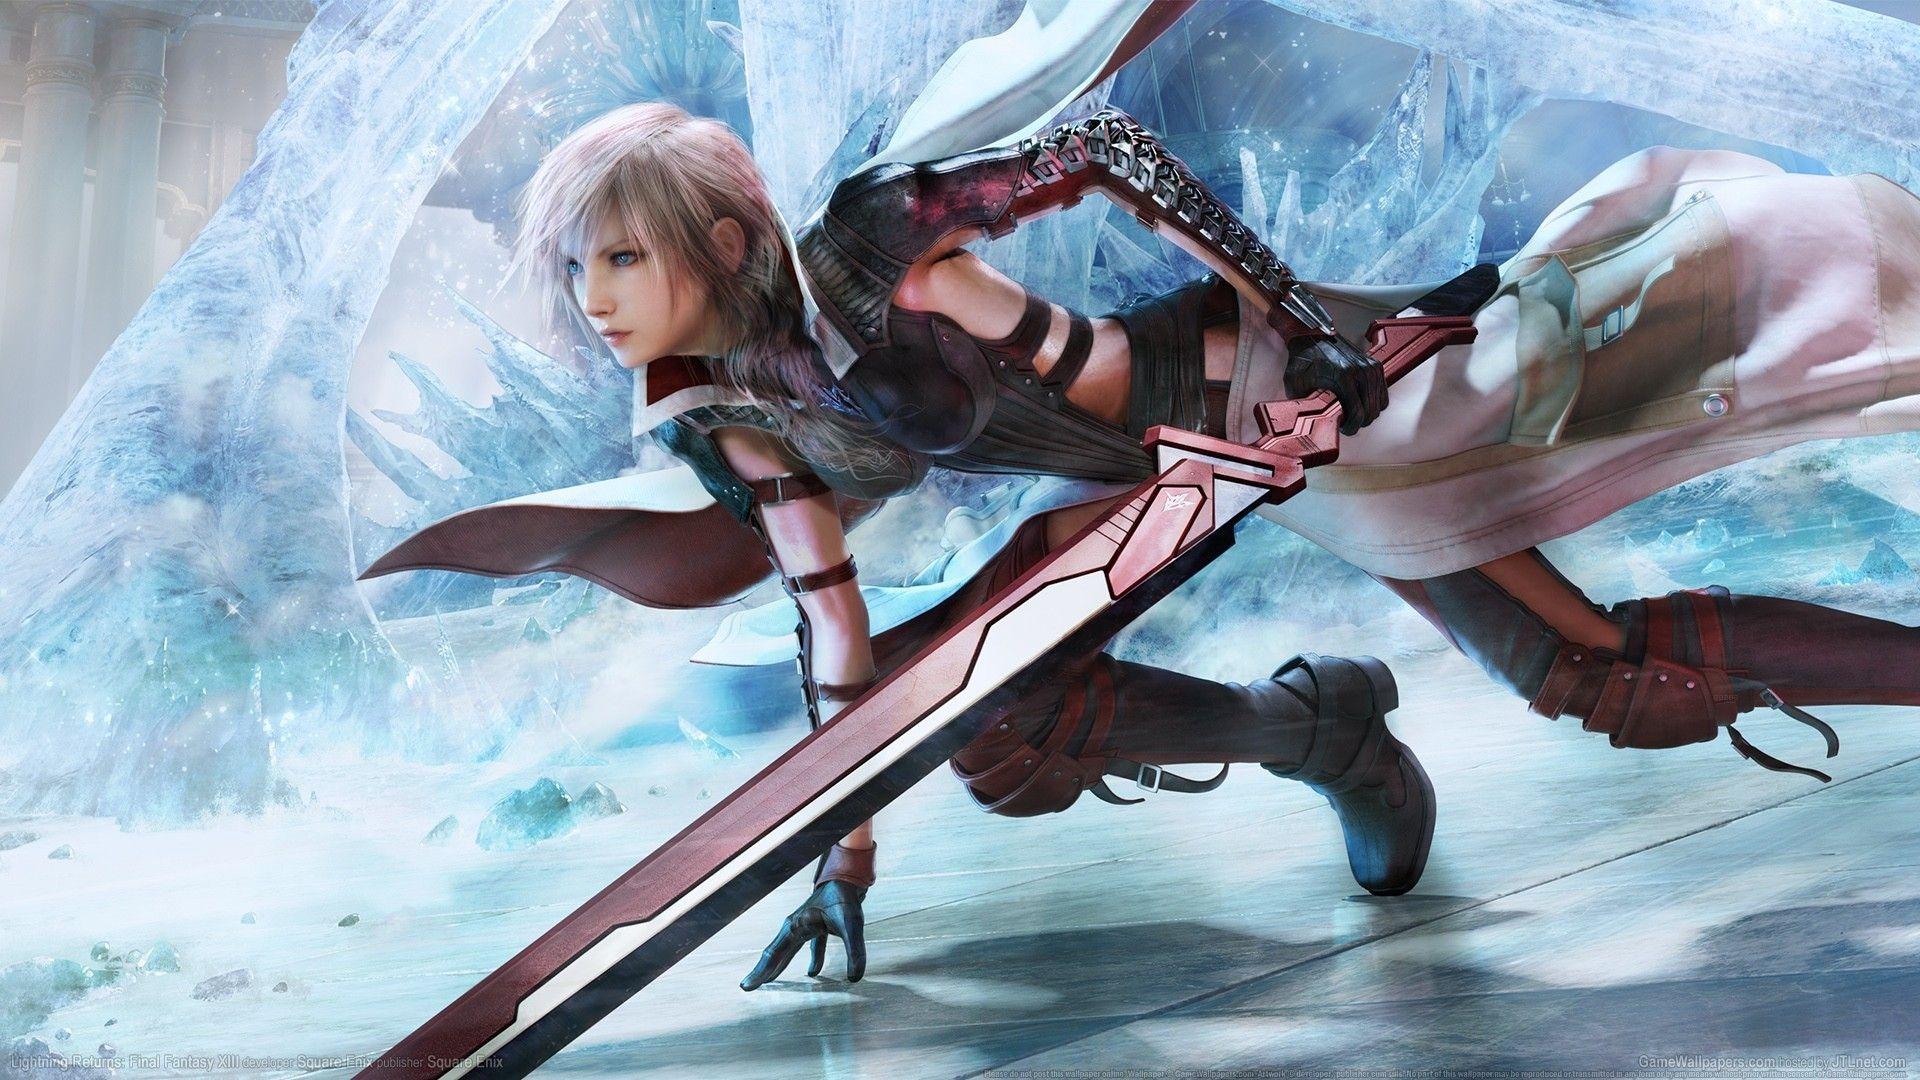 Sword Ice Video Games Claire Farron Final Fantasy Xiii